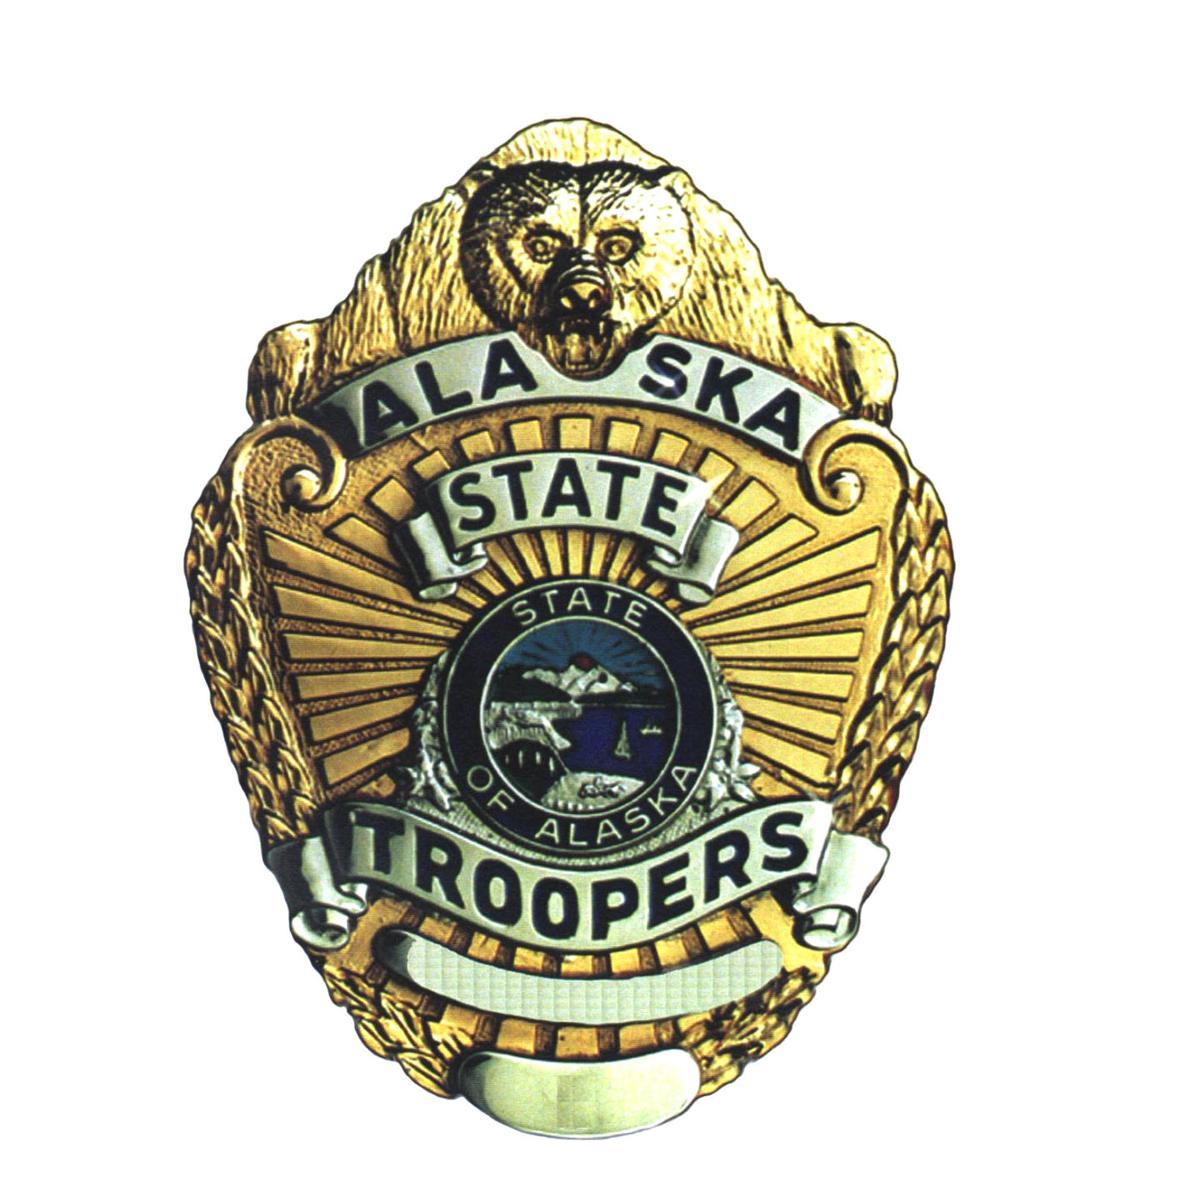 Troopers logo